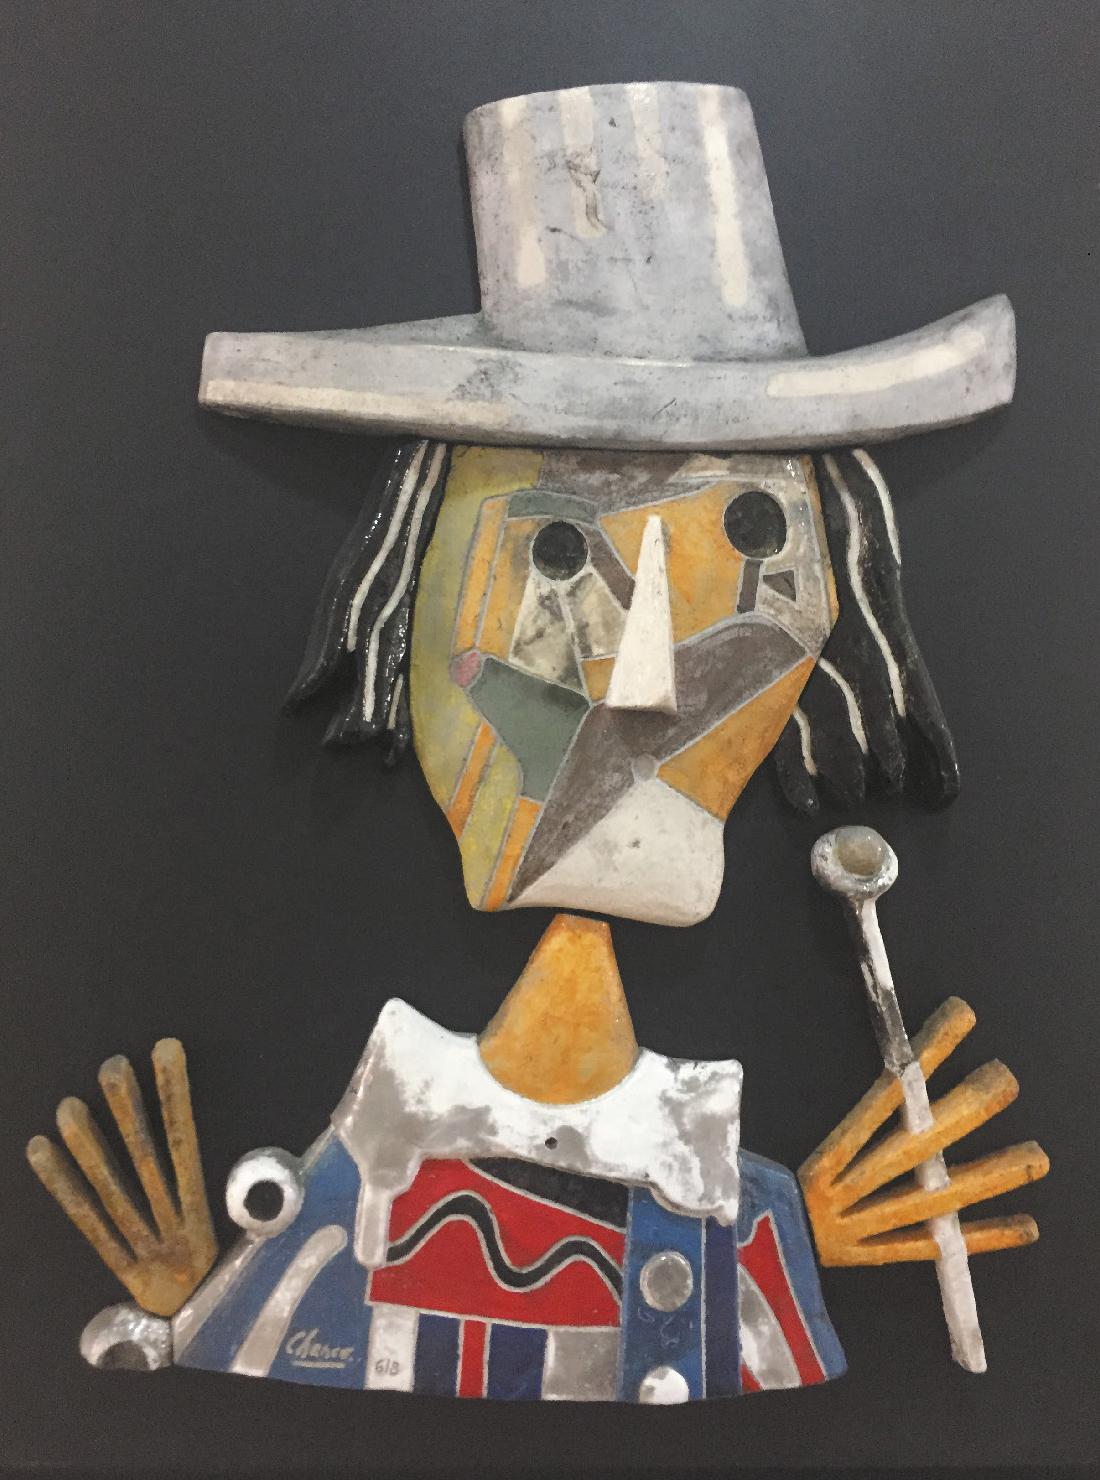 Lot 84 - Chanco Roland (1914-2017) Le vieux Dandy - 1993 - 100 x 75 cm - Mixed media on panel [...]